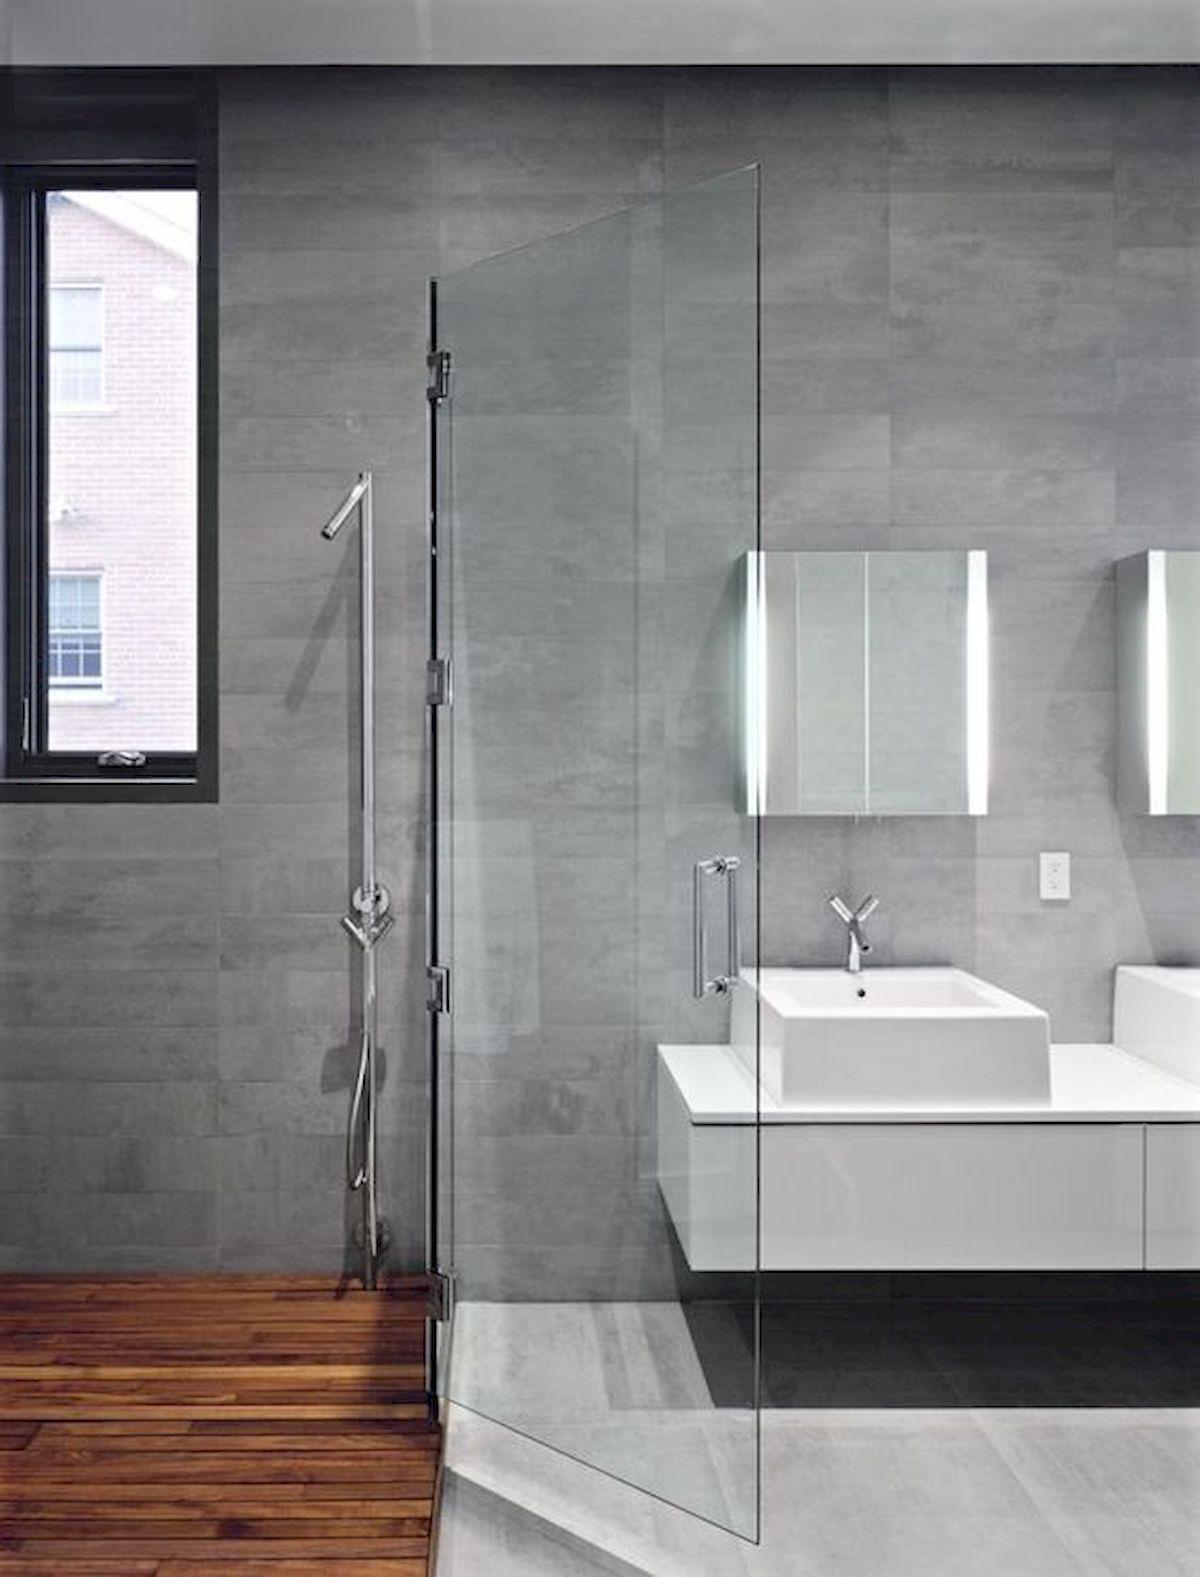 26 Easy And Creative DIY Mirror Ideas To Decorate Your Bathroom (3)